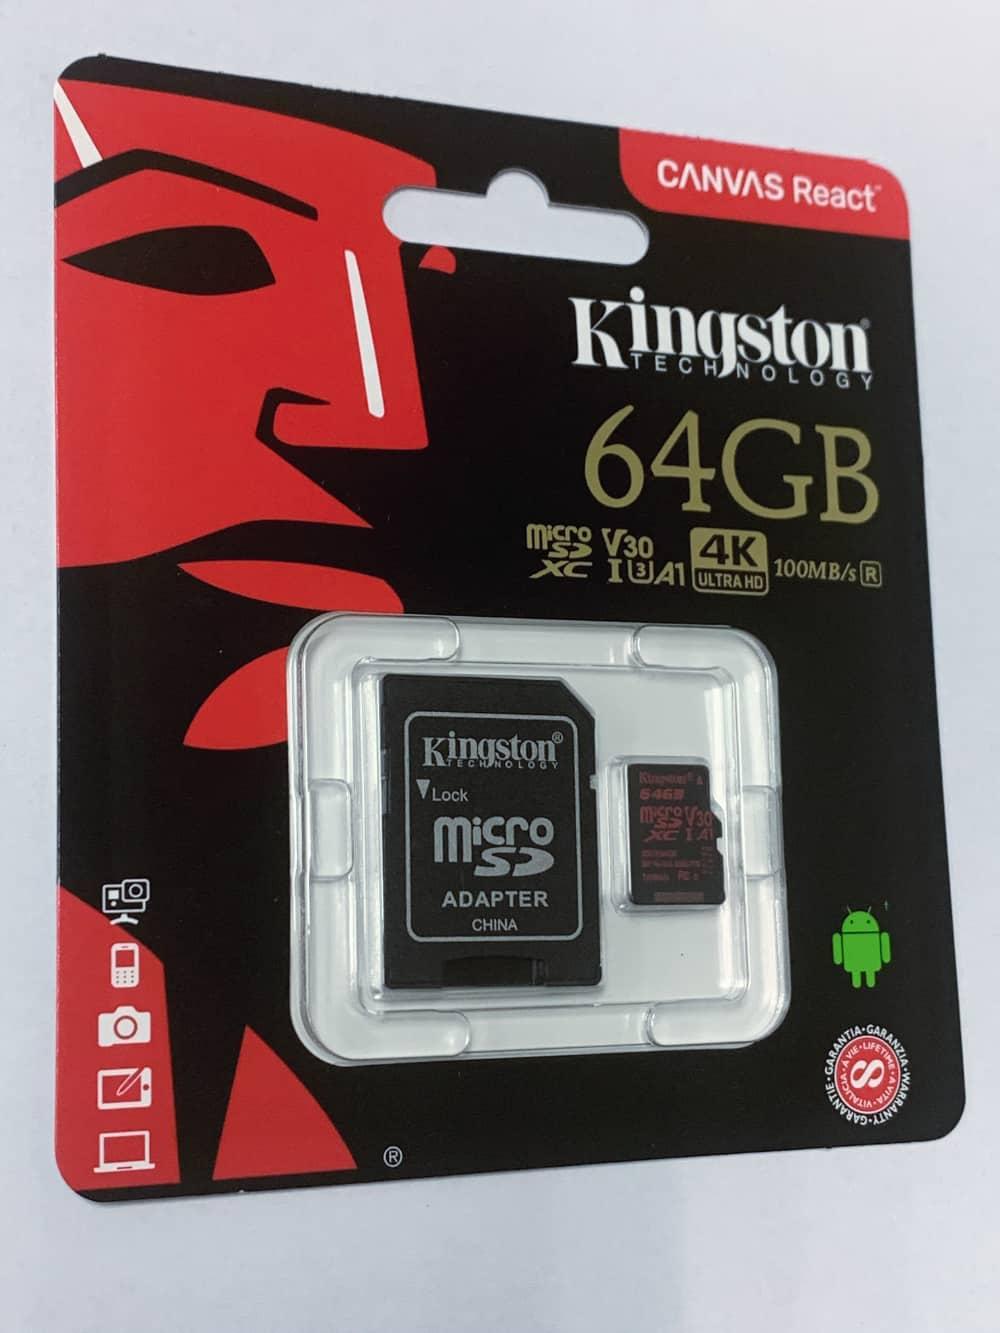 KINGSTON 64GB microSDXC karta CANVAS REACT, UHS-I Class 3 (čtení/zápis 100/70MB/s) + adaptér (SDCR/64GB)